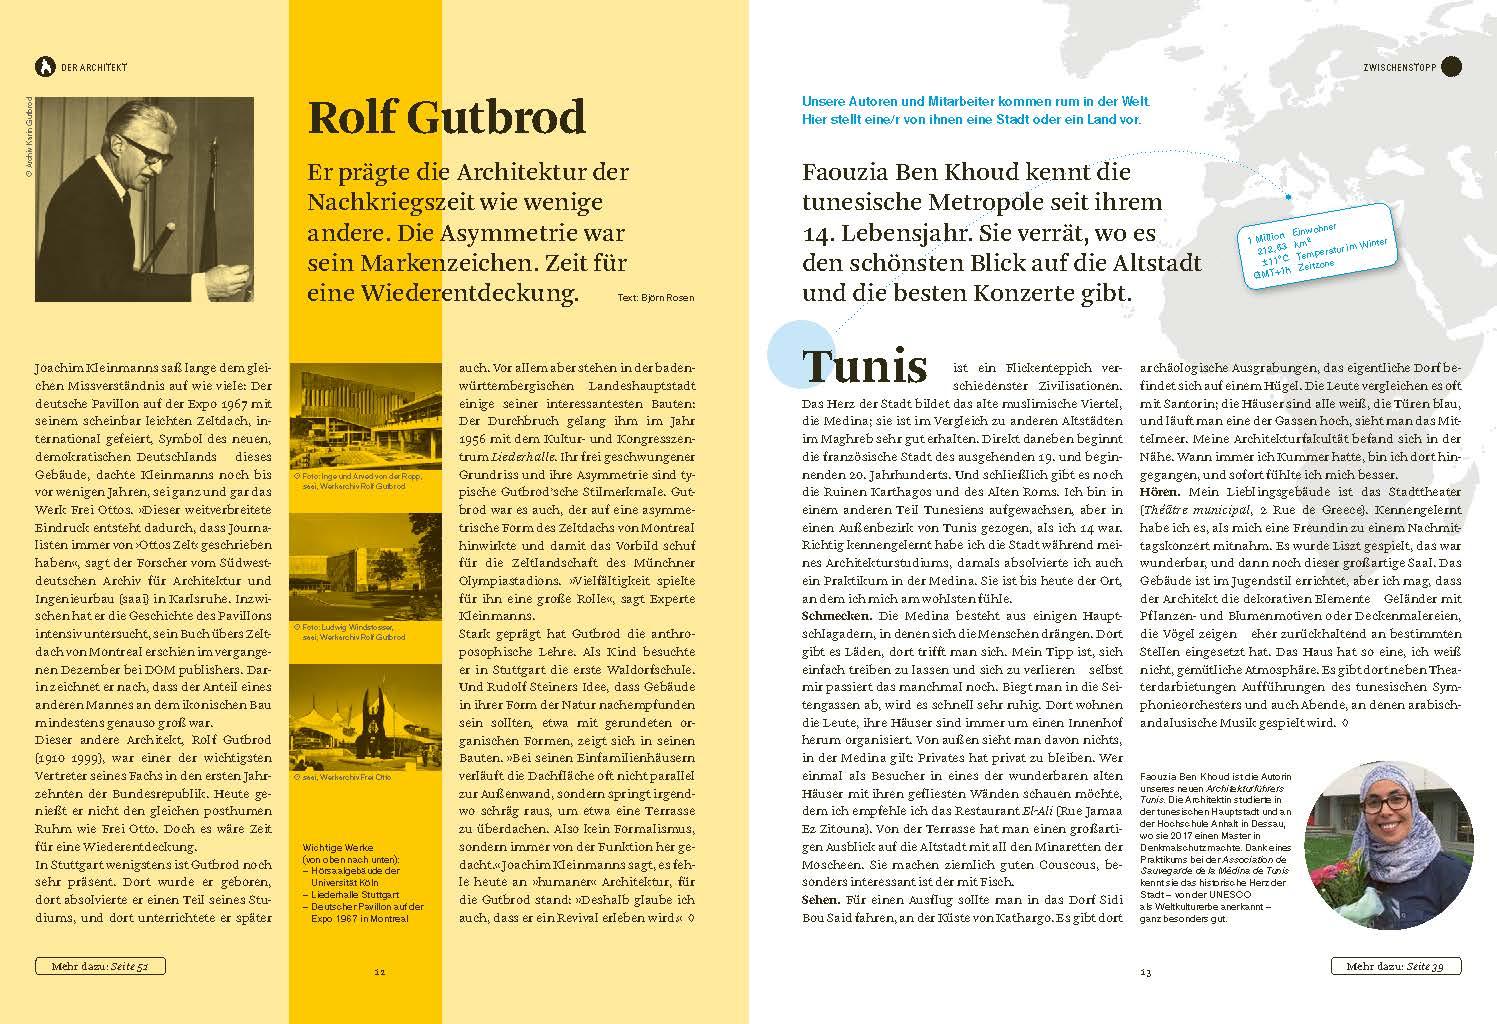 DOM magazine 01/2020, Seiten 12/13 (Bild: DOM publishers)